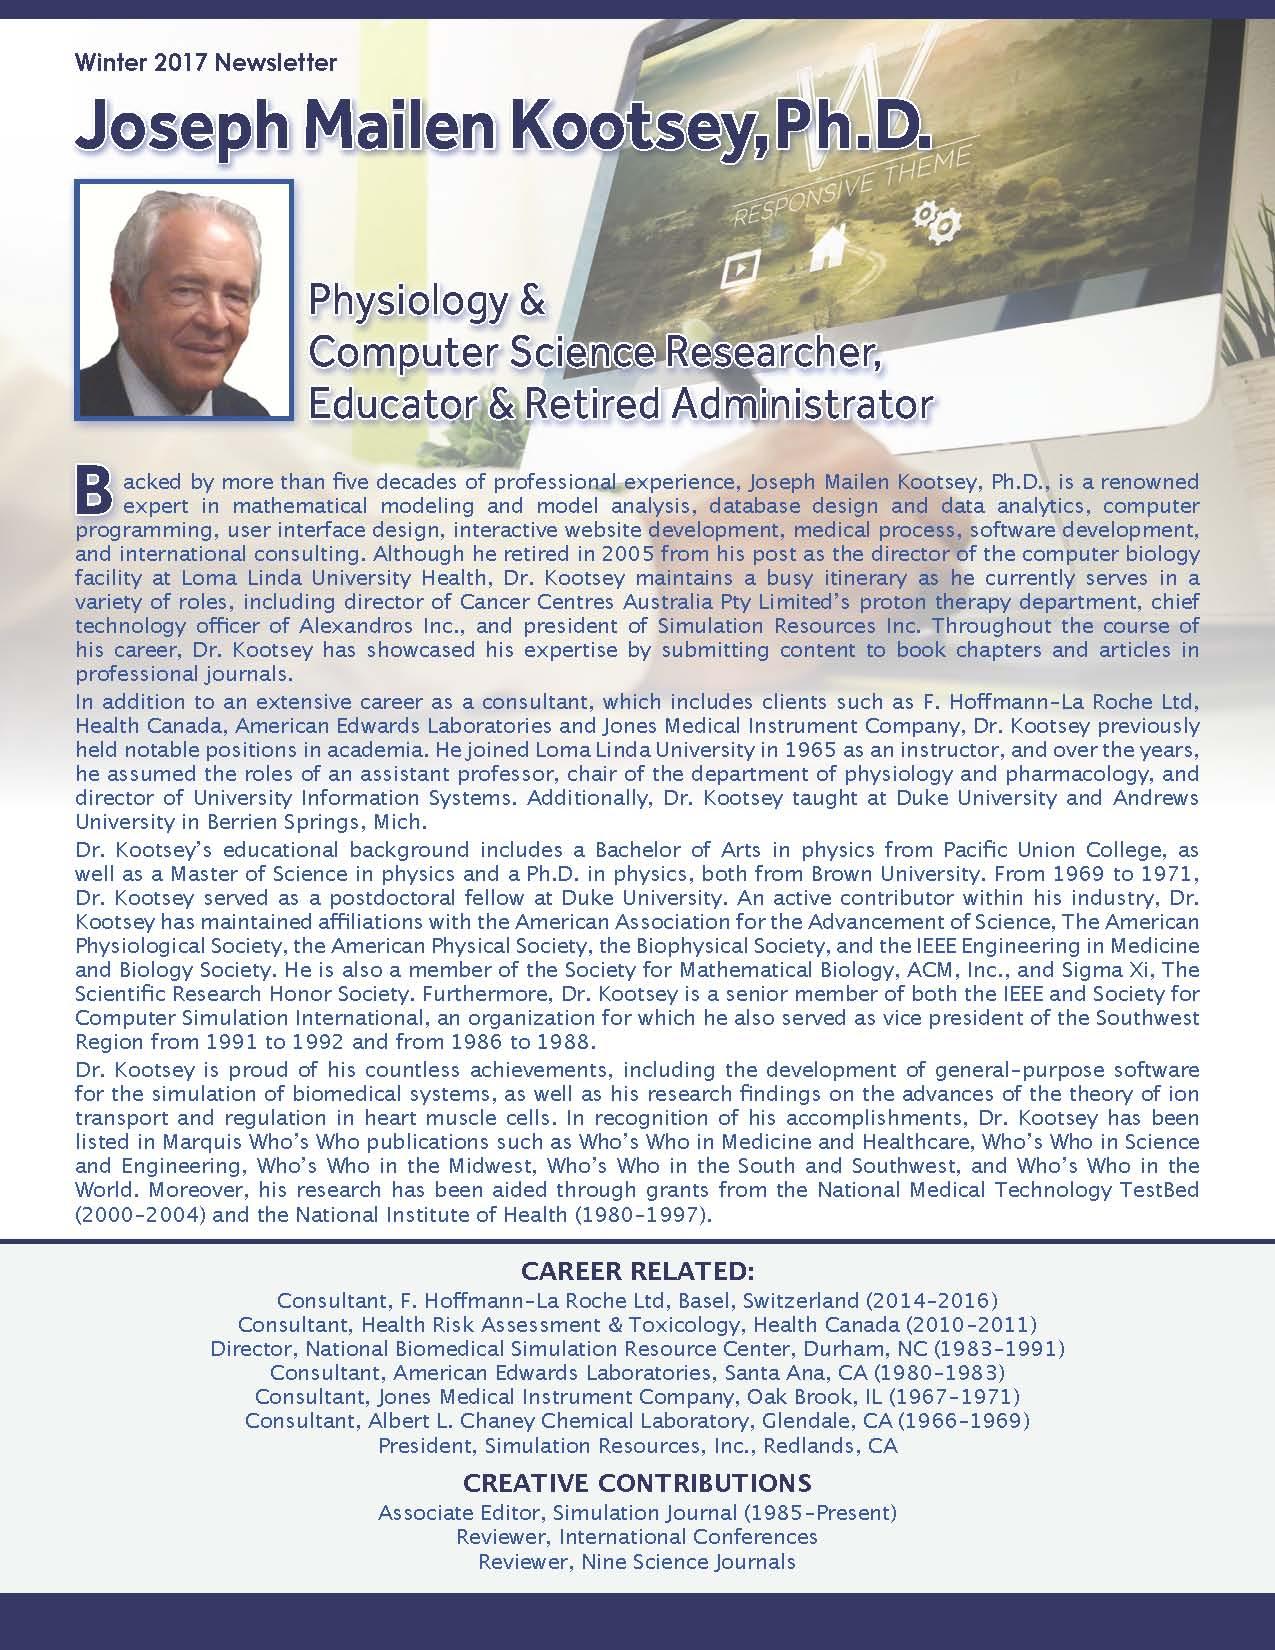 Kootsey, Joseph 3645072_15409816 Newsletter